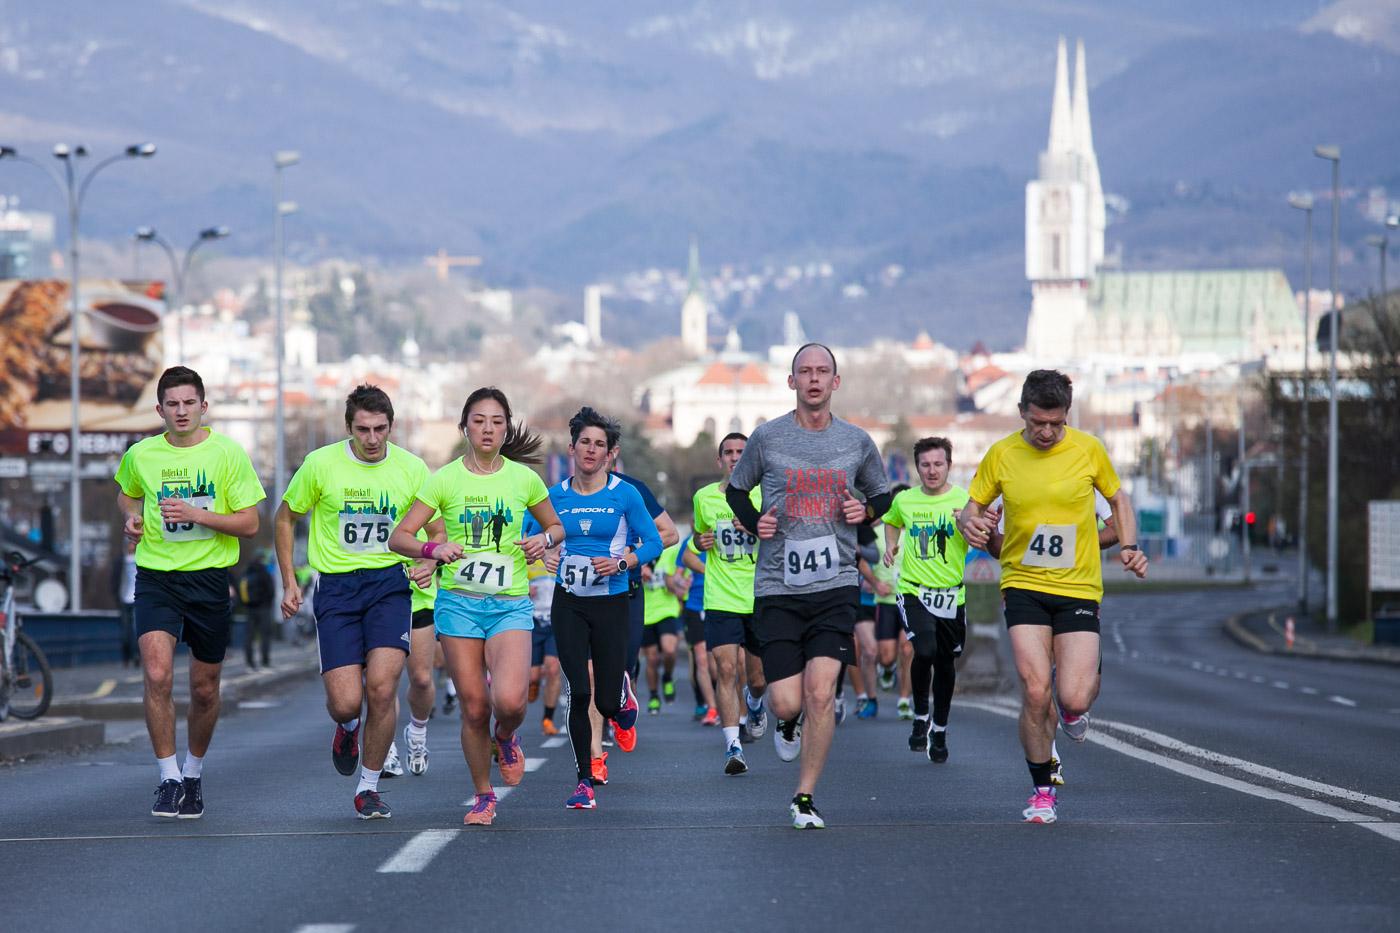 [FOTO] Otrčana Holjevka – užitak trčanja s pogledom na Sljeme